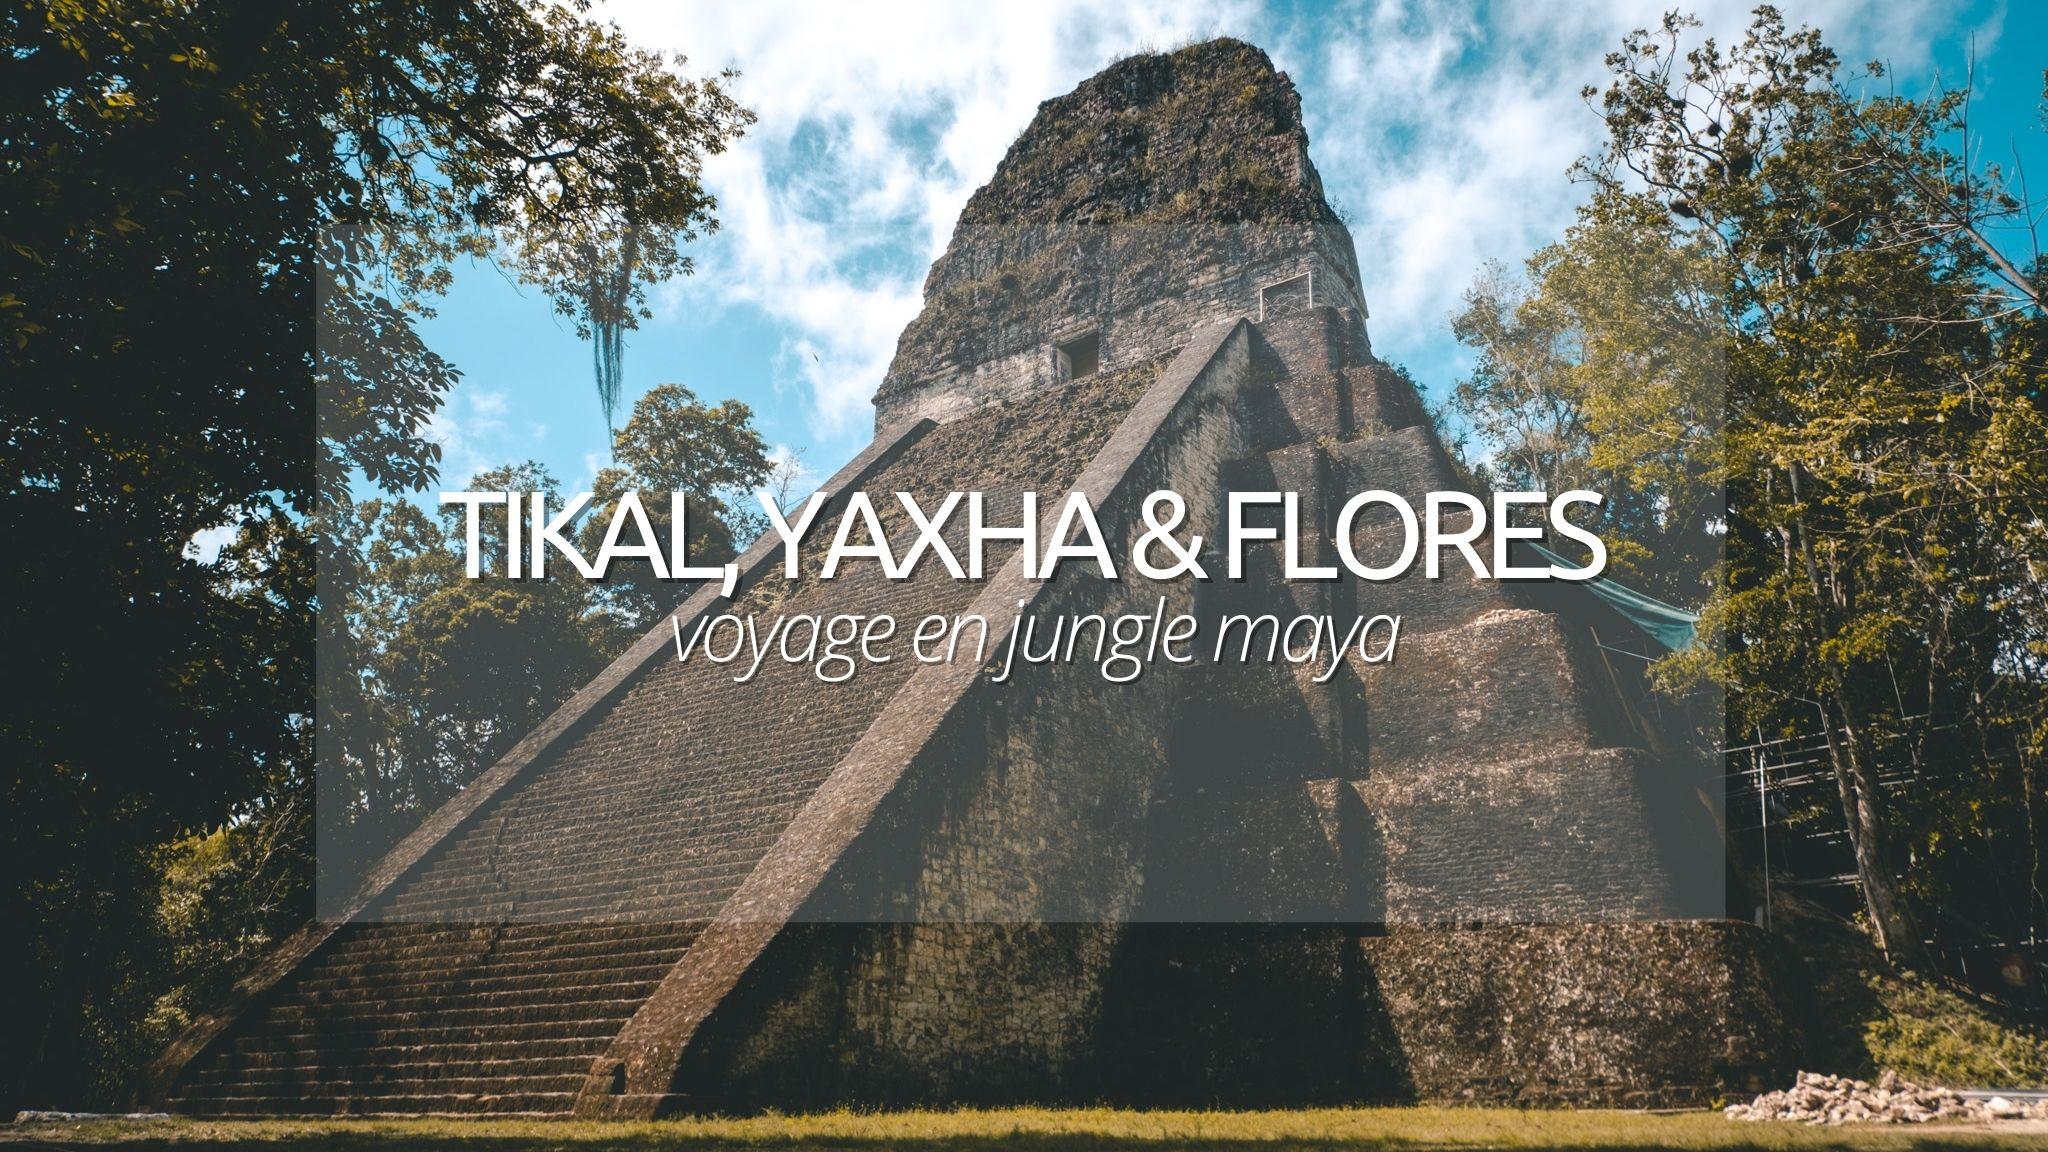 Visiter Tikal, Yaxha et Flores au Guatemala : voyage en pleine jungle maya.